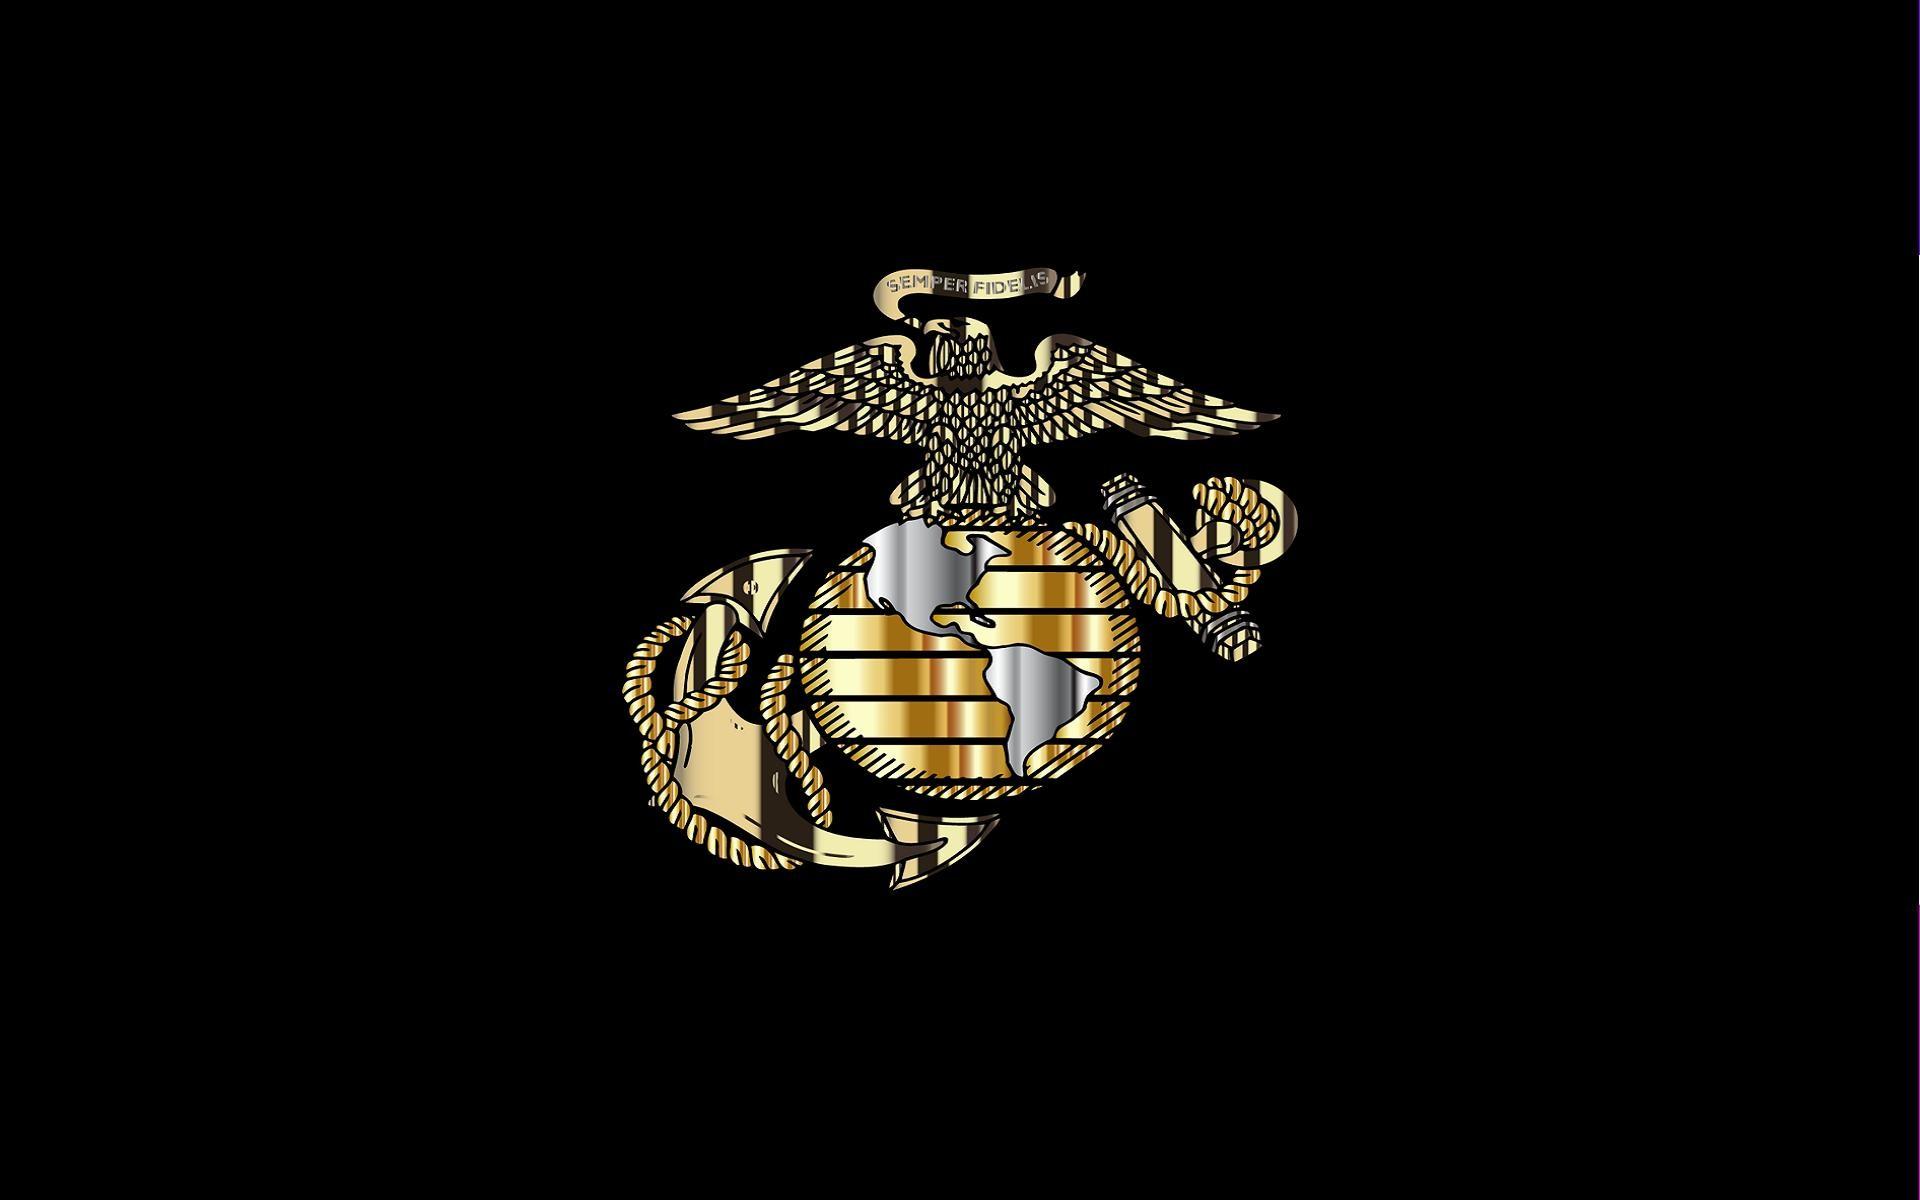 USMC-wallpapers-HD